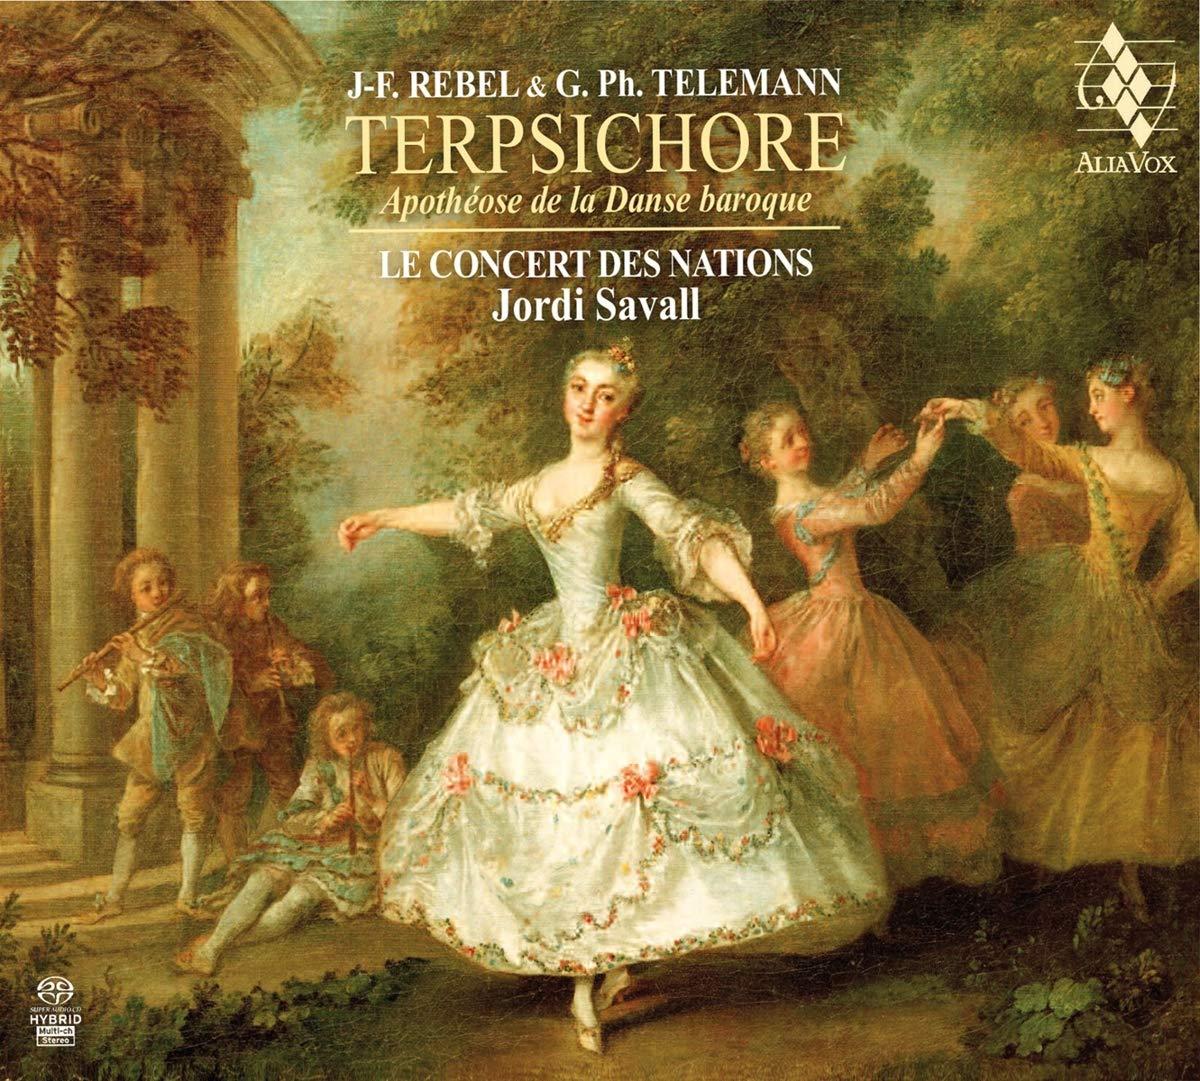 SACD : Jordi Savall - Terpsichore - Apothiose De La Danse Baroque (SACD)